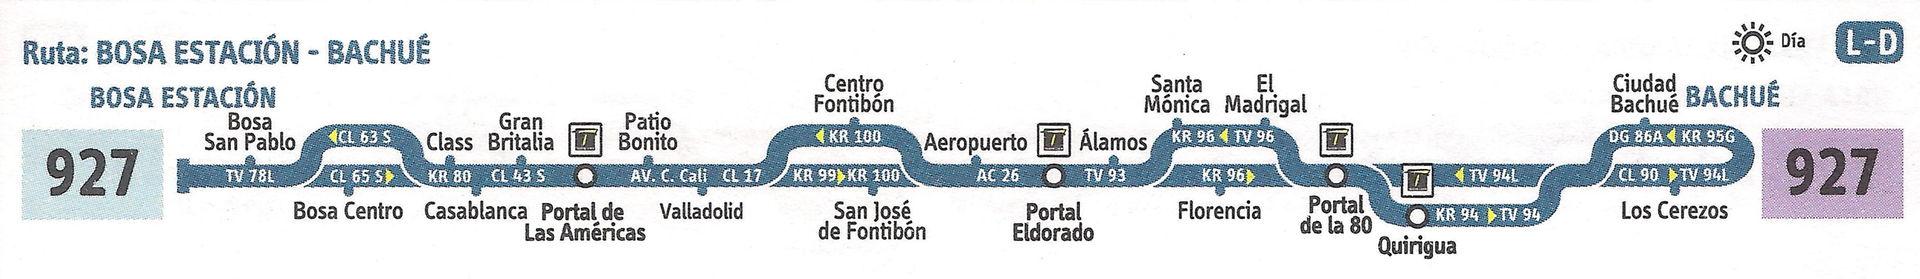 Ruta SITP: 927 Bachué ↔ Bosa, San Pablo [Urbana] 1